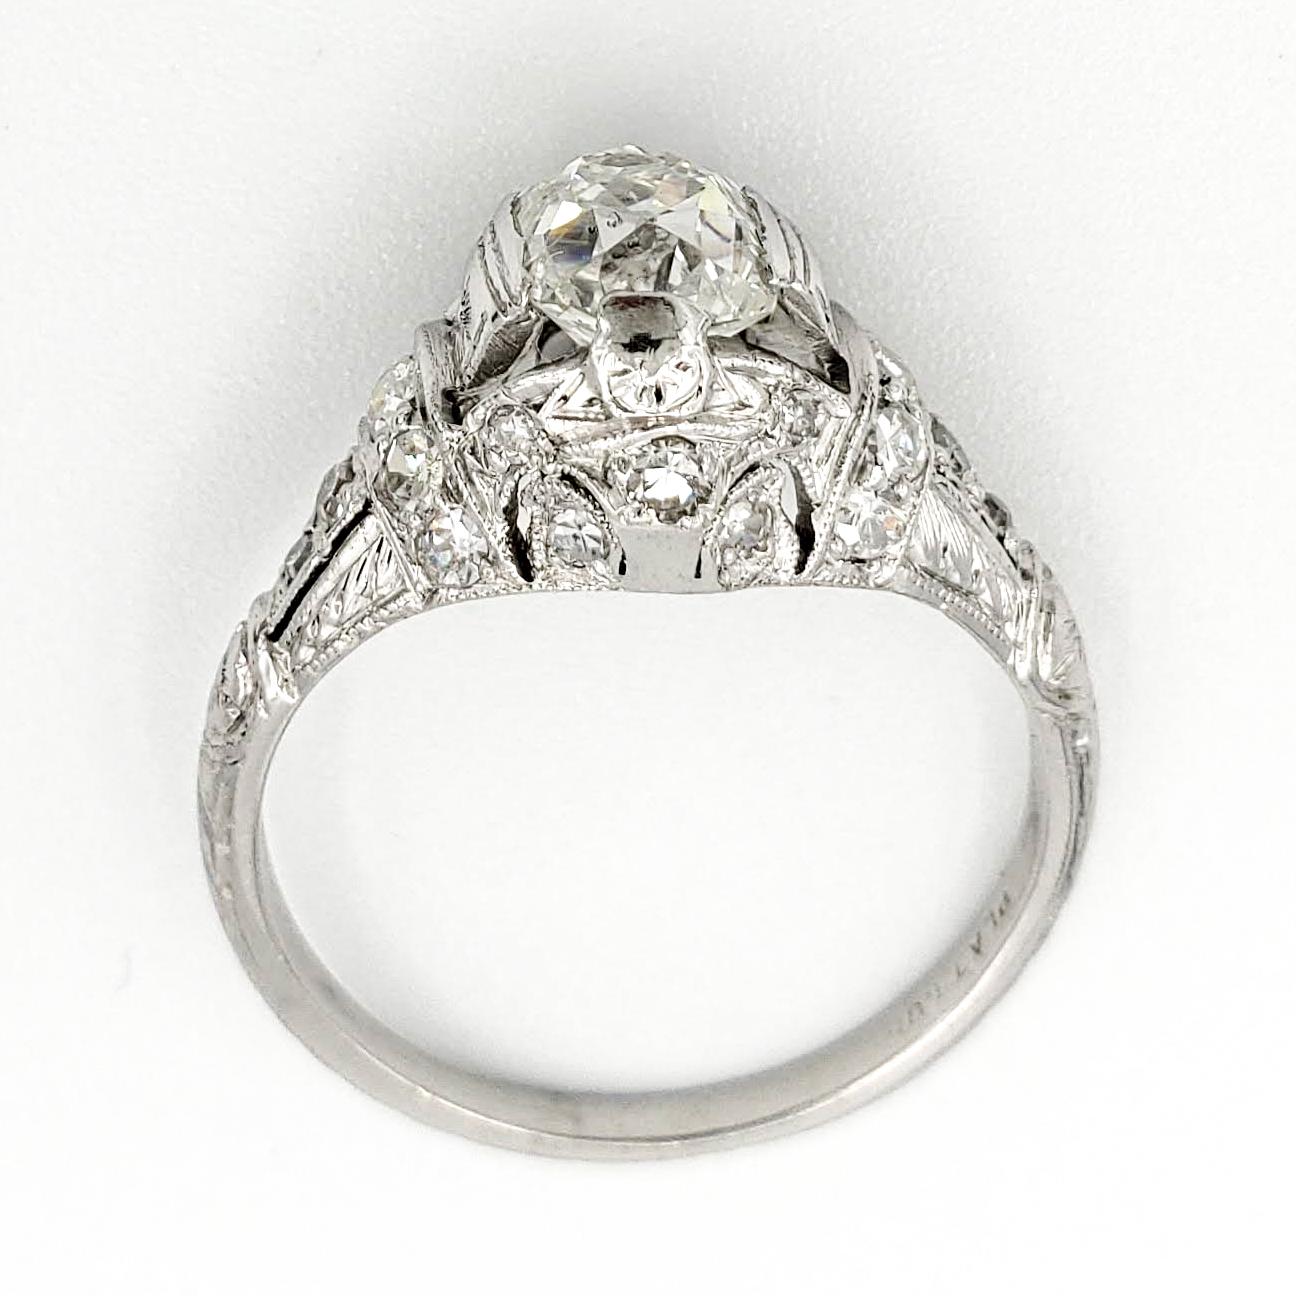 vintage-platinum-engagement-ring-with-1-23-old-mine-cut-diamond-egl-g-si1